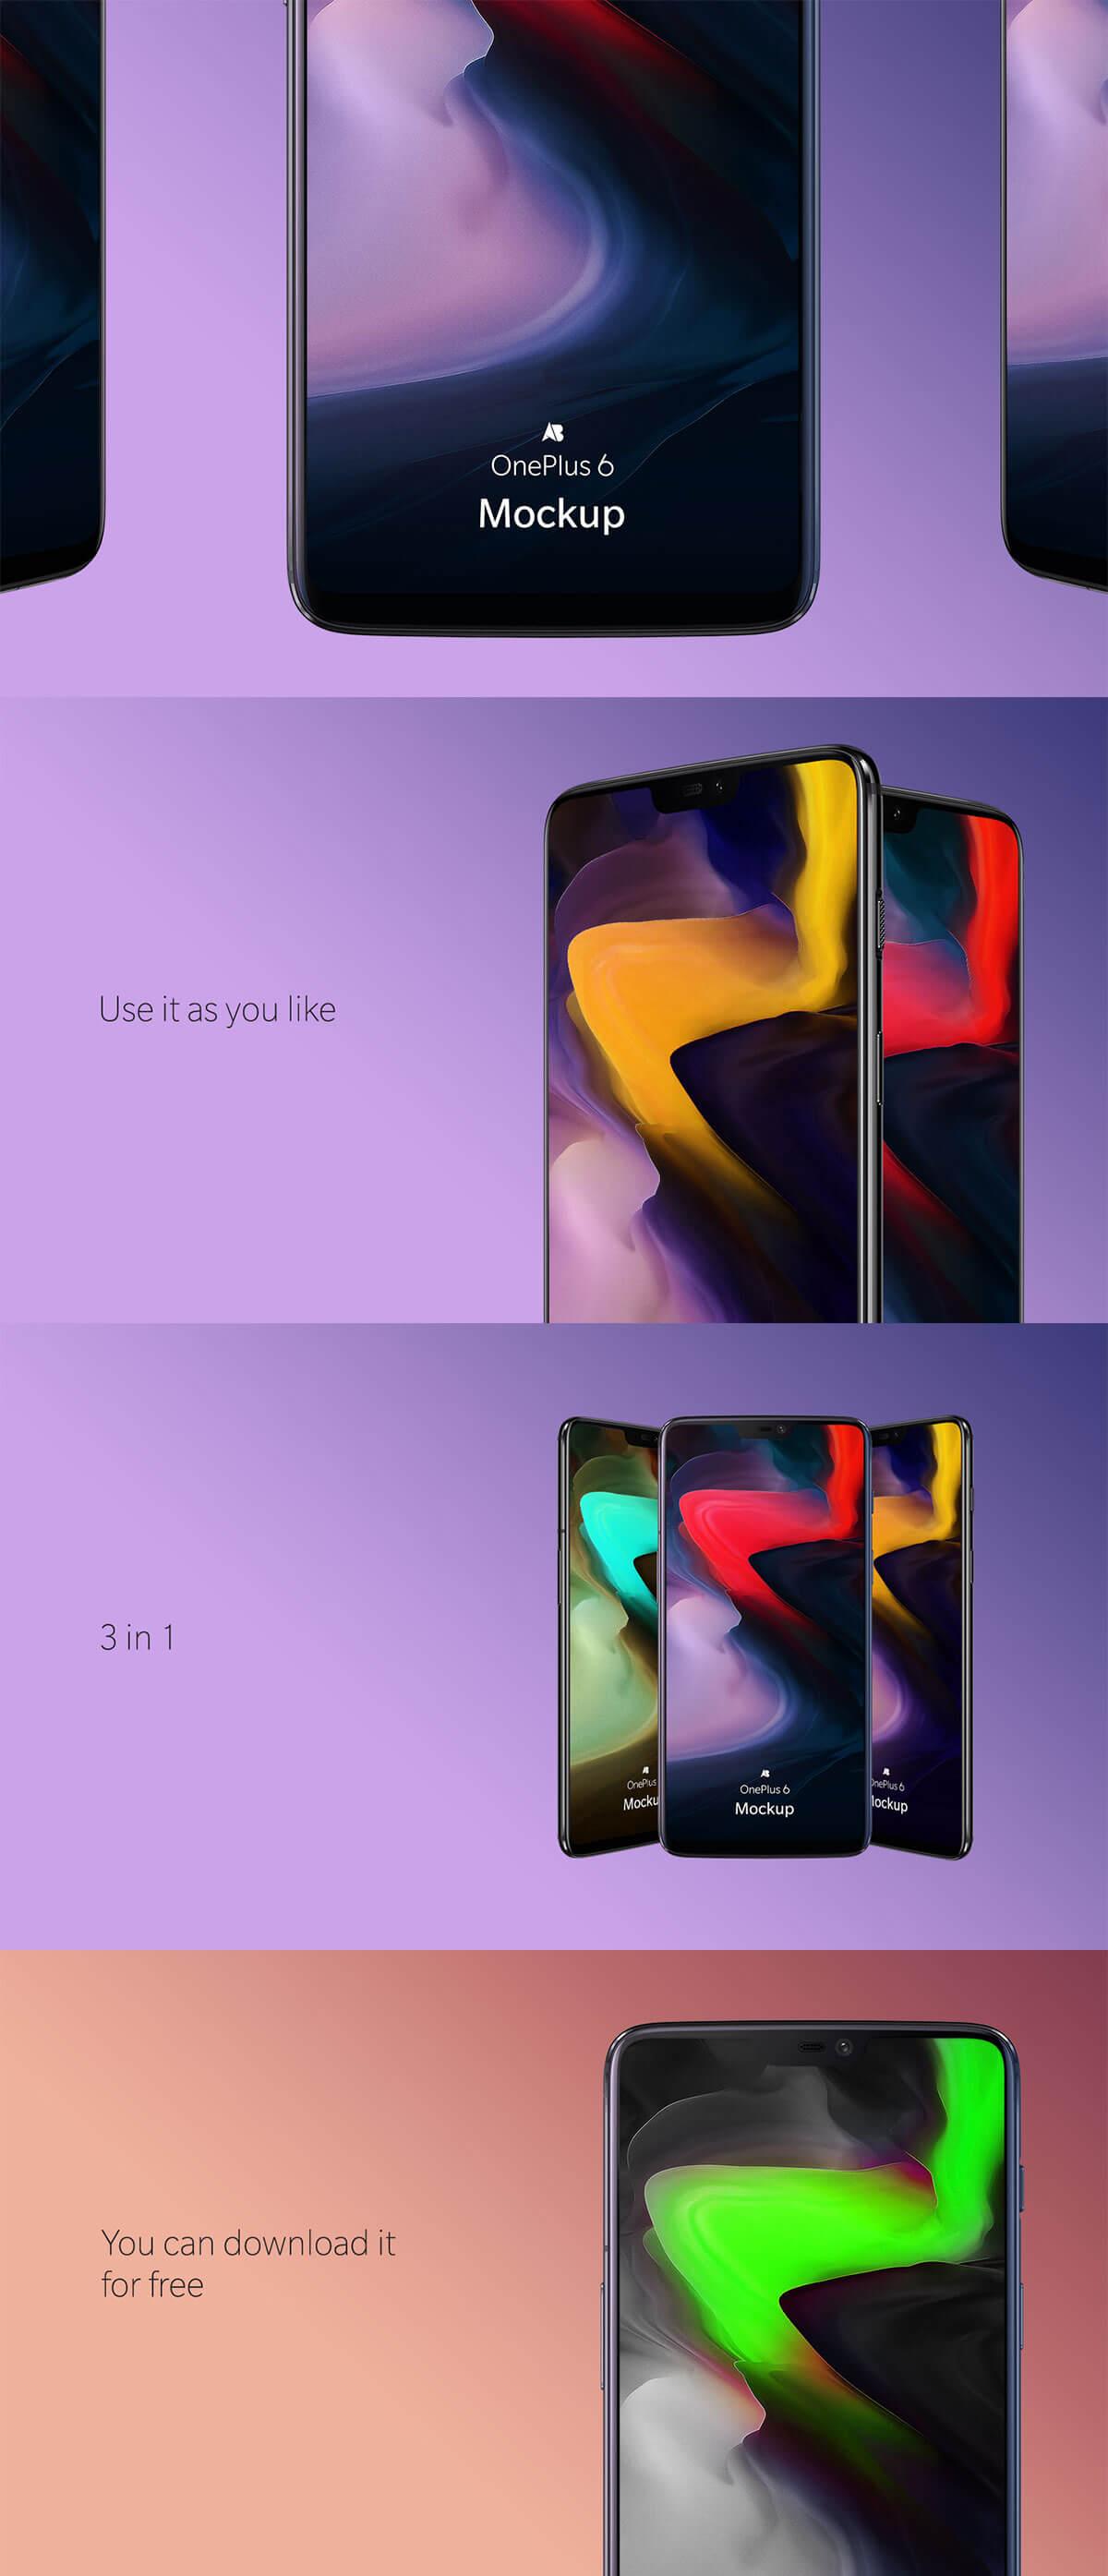 Free OnePlus 6 Mockup